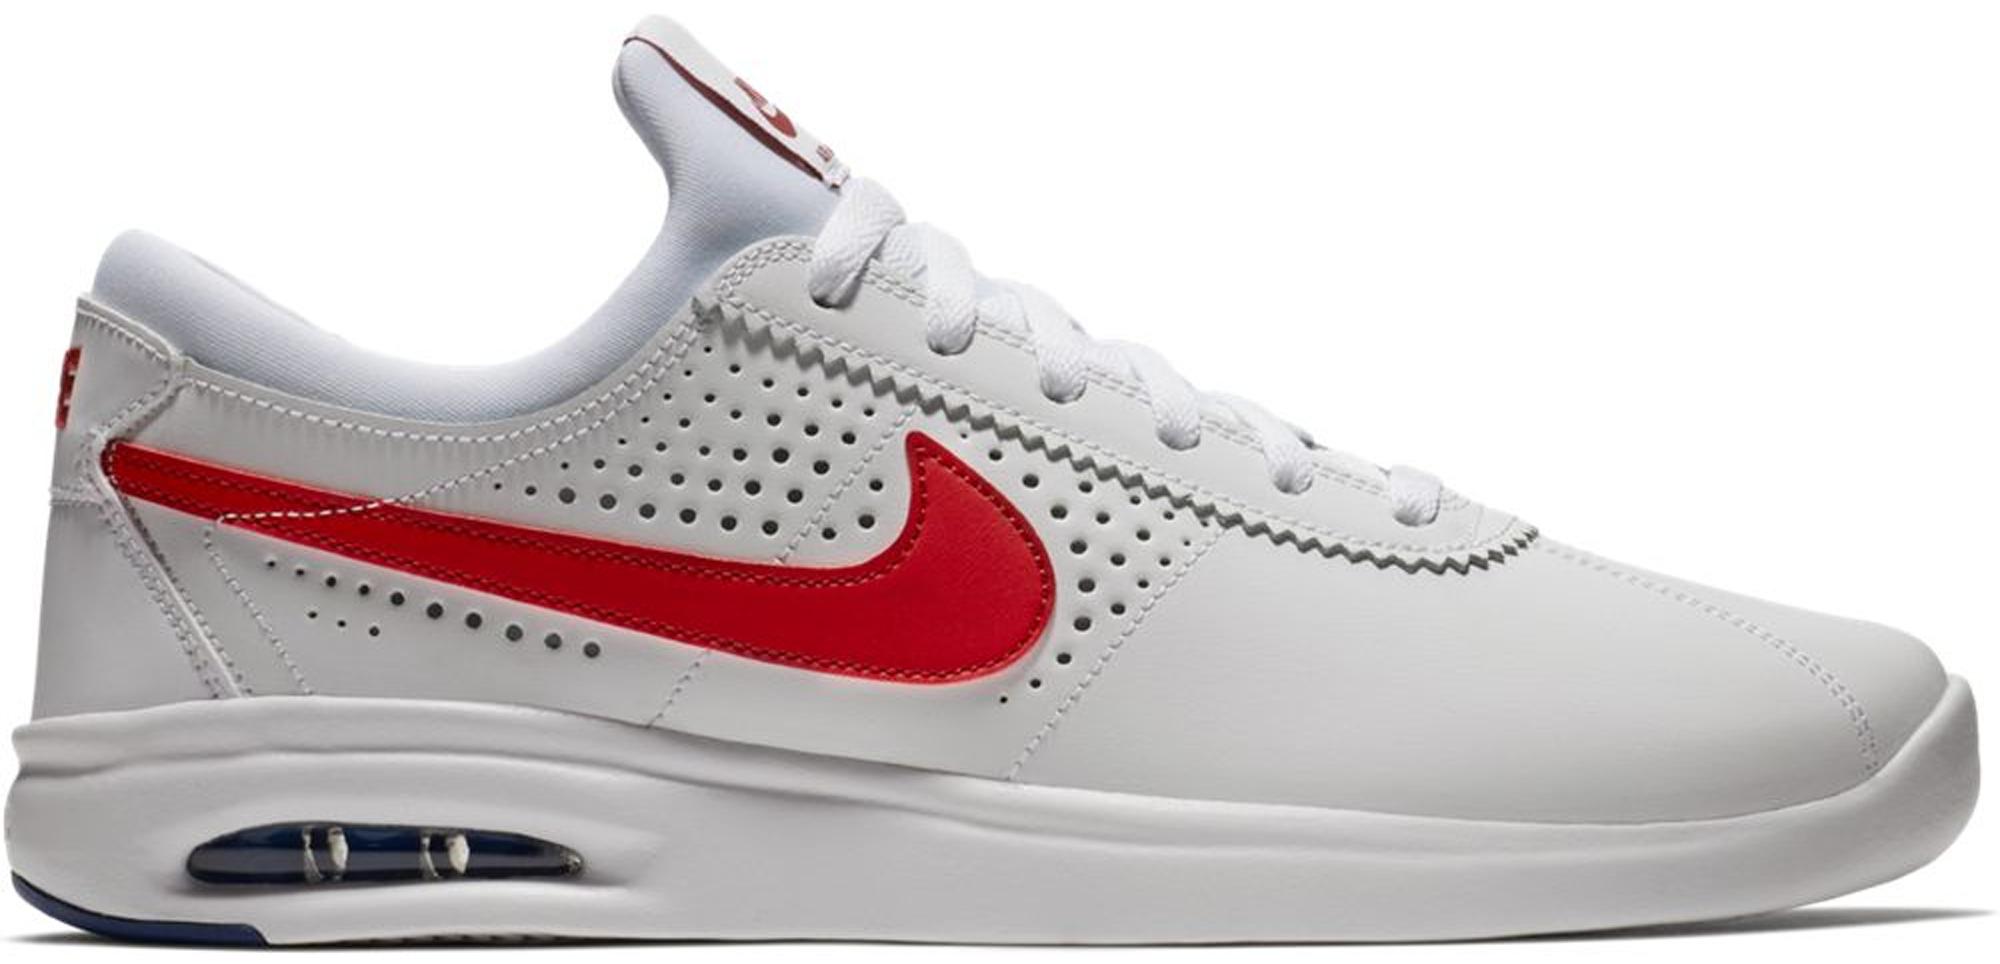 Nike SB Air Max Bruin Vapor White Red